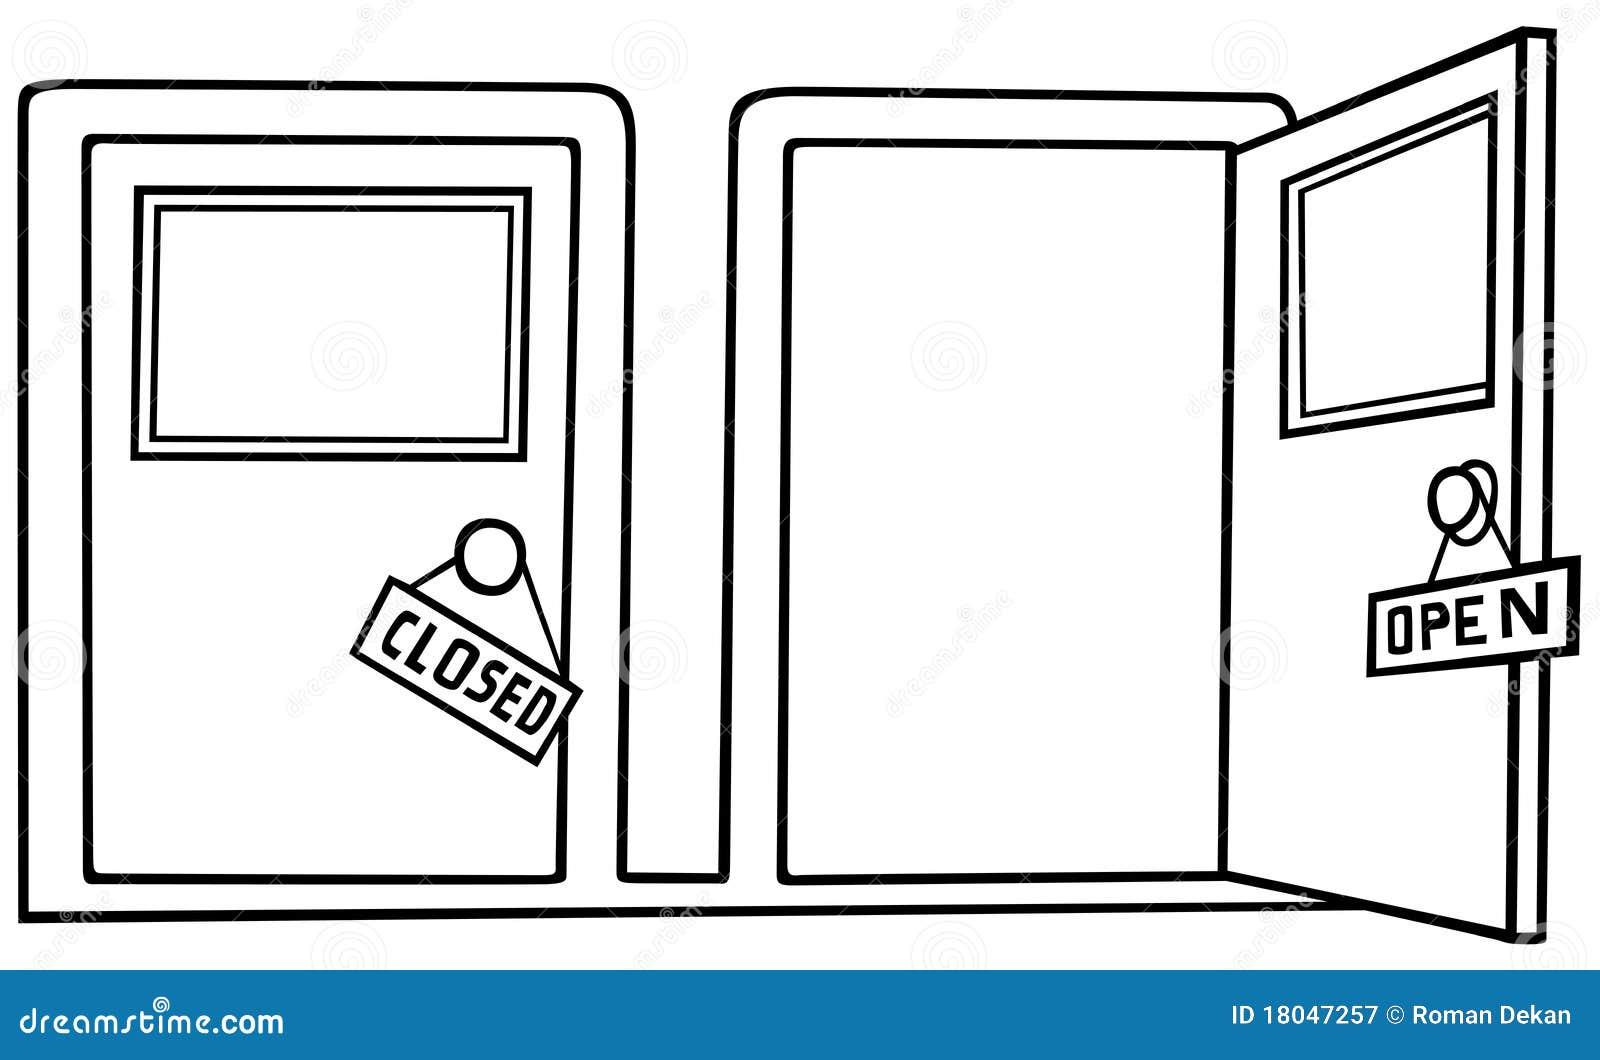 Door Open and Close  sc 1 st  Dreamstime.com & Door Open and Close stock vector. Illustration of open - 18047257